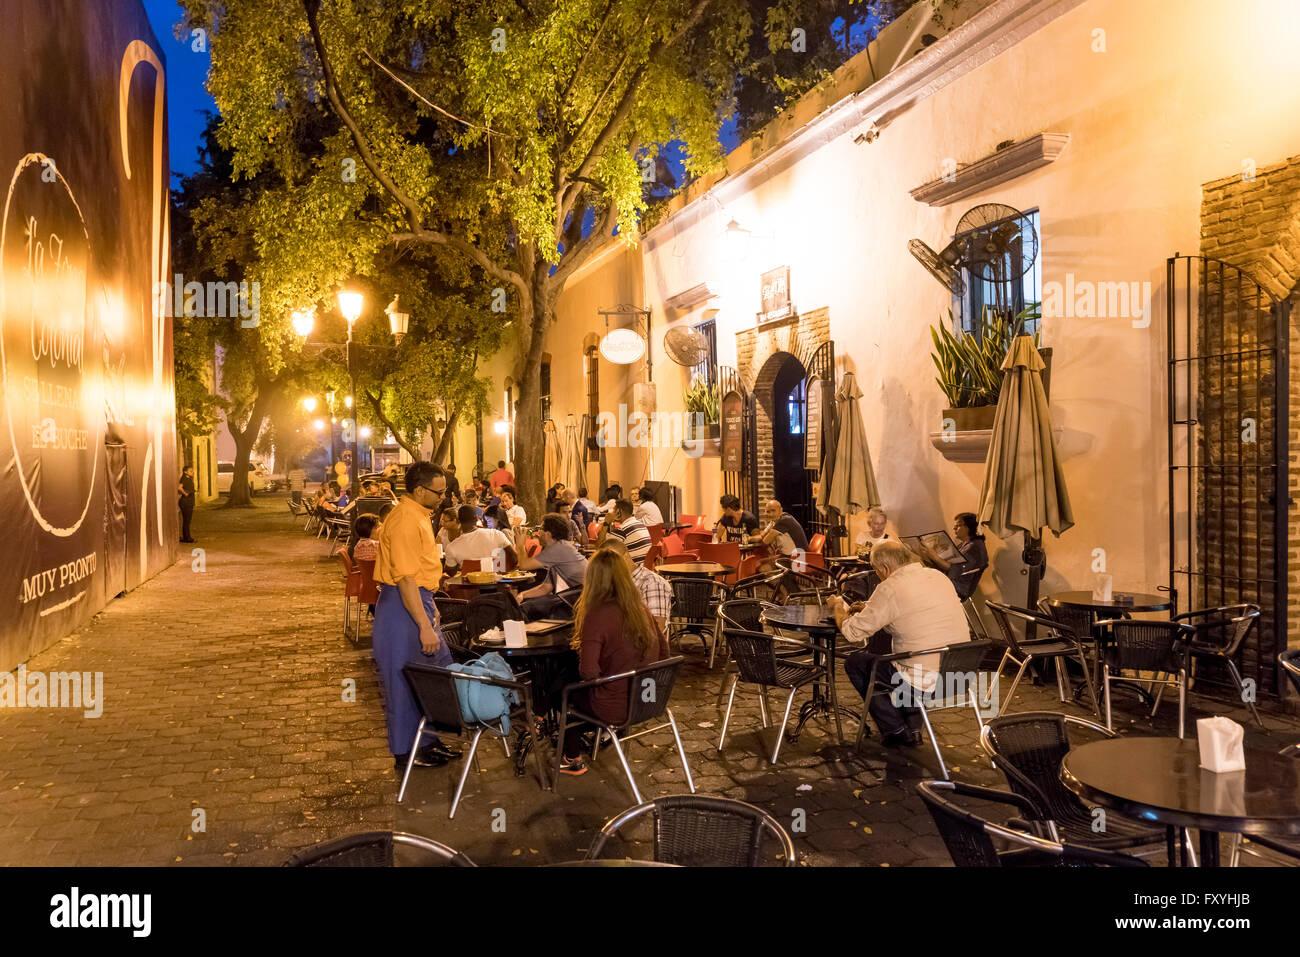 Sidewalk cafe SegaZona in the Zona Colonial old town, Santo Domingo, Dominican Republic Stock Photo